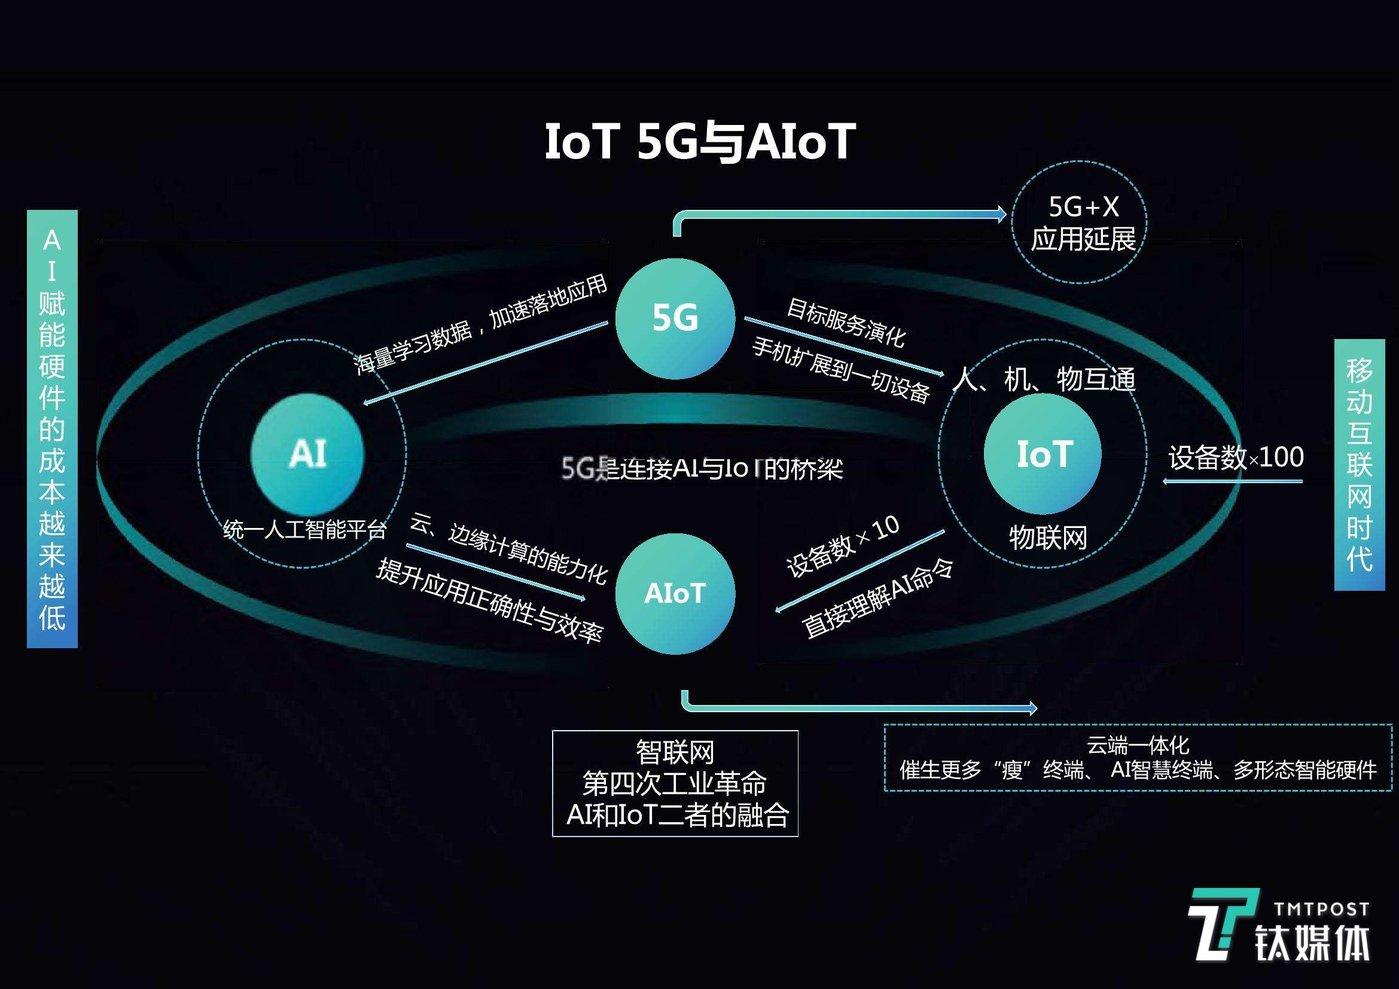 5G对IoT的深度应用